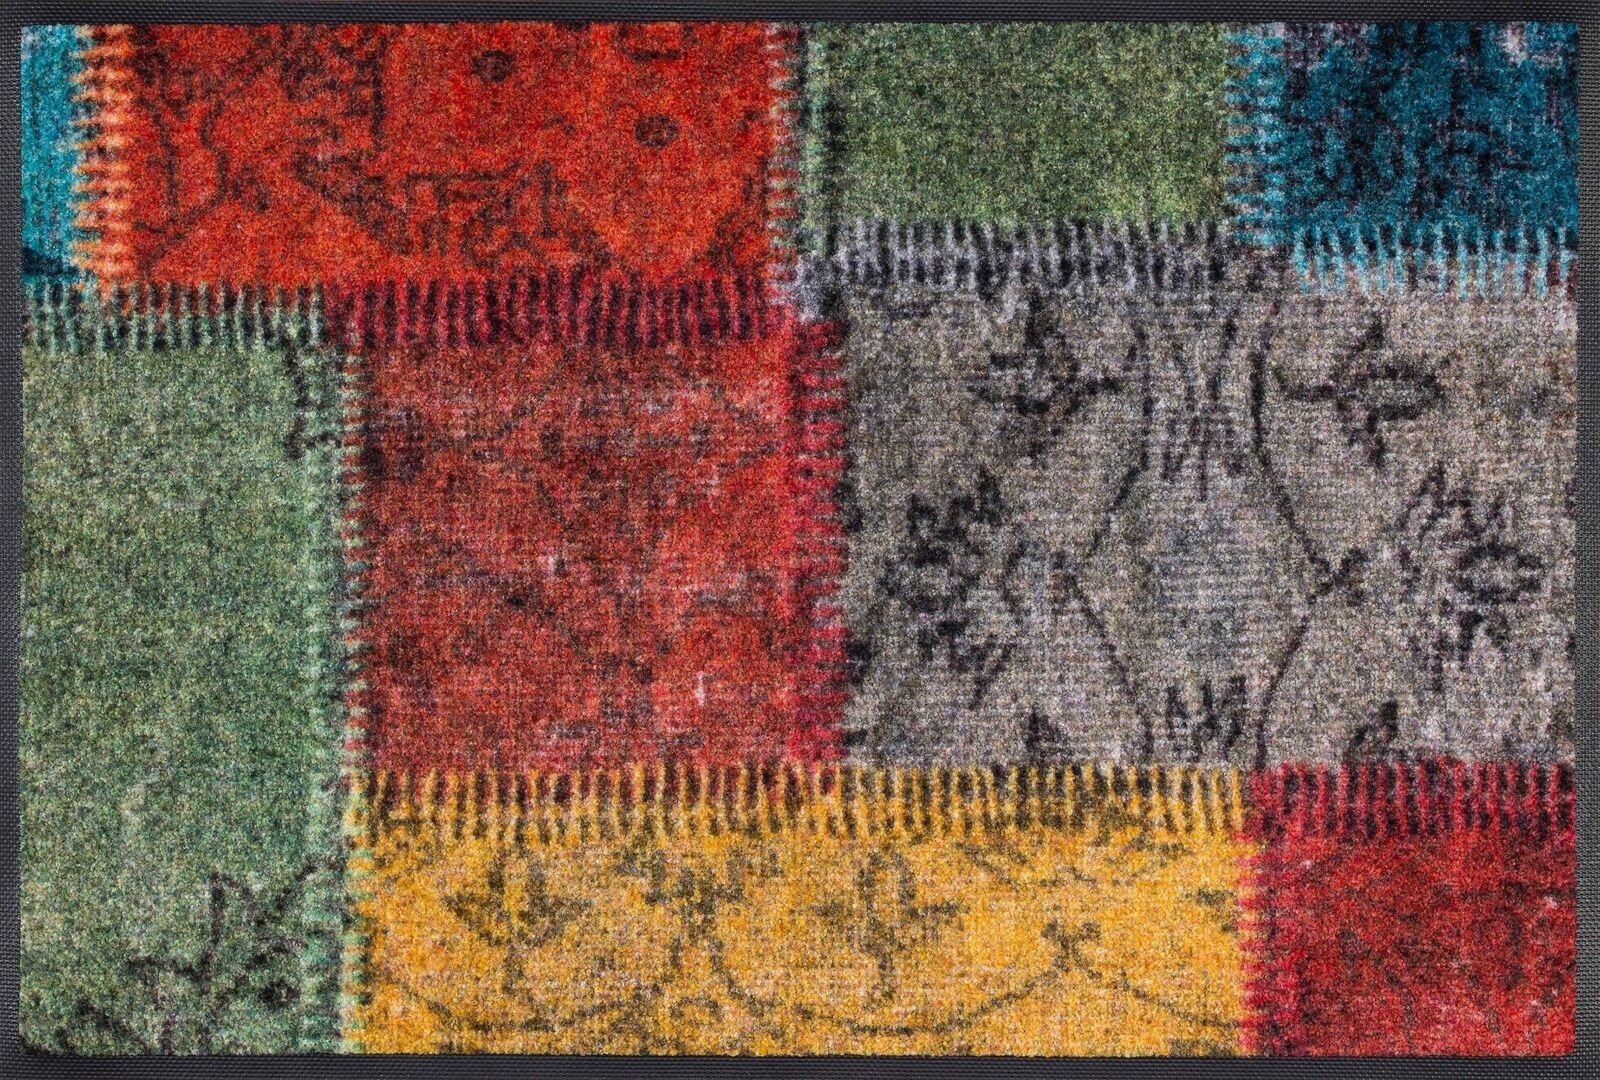 Wash+dry Fußmatte Vintage Vintage Vintage Patches waschbare Fußmatte Patchwork 6ce7ff